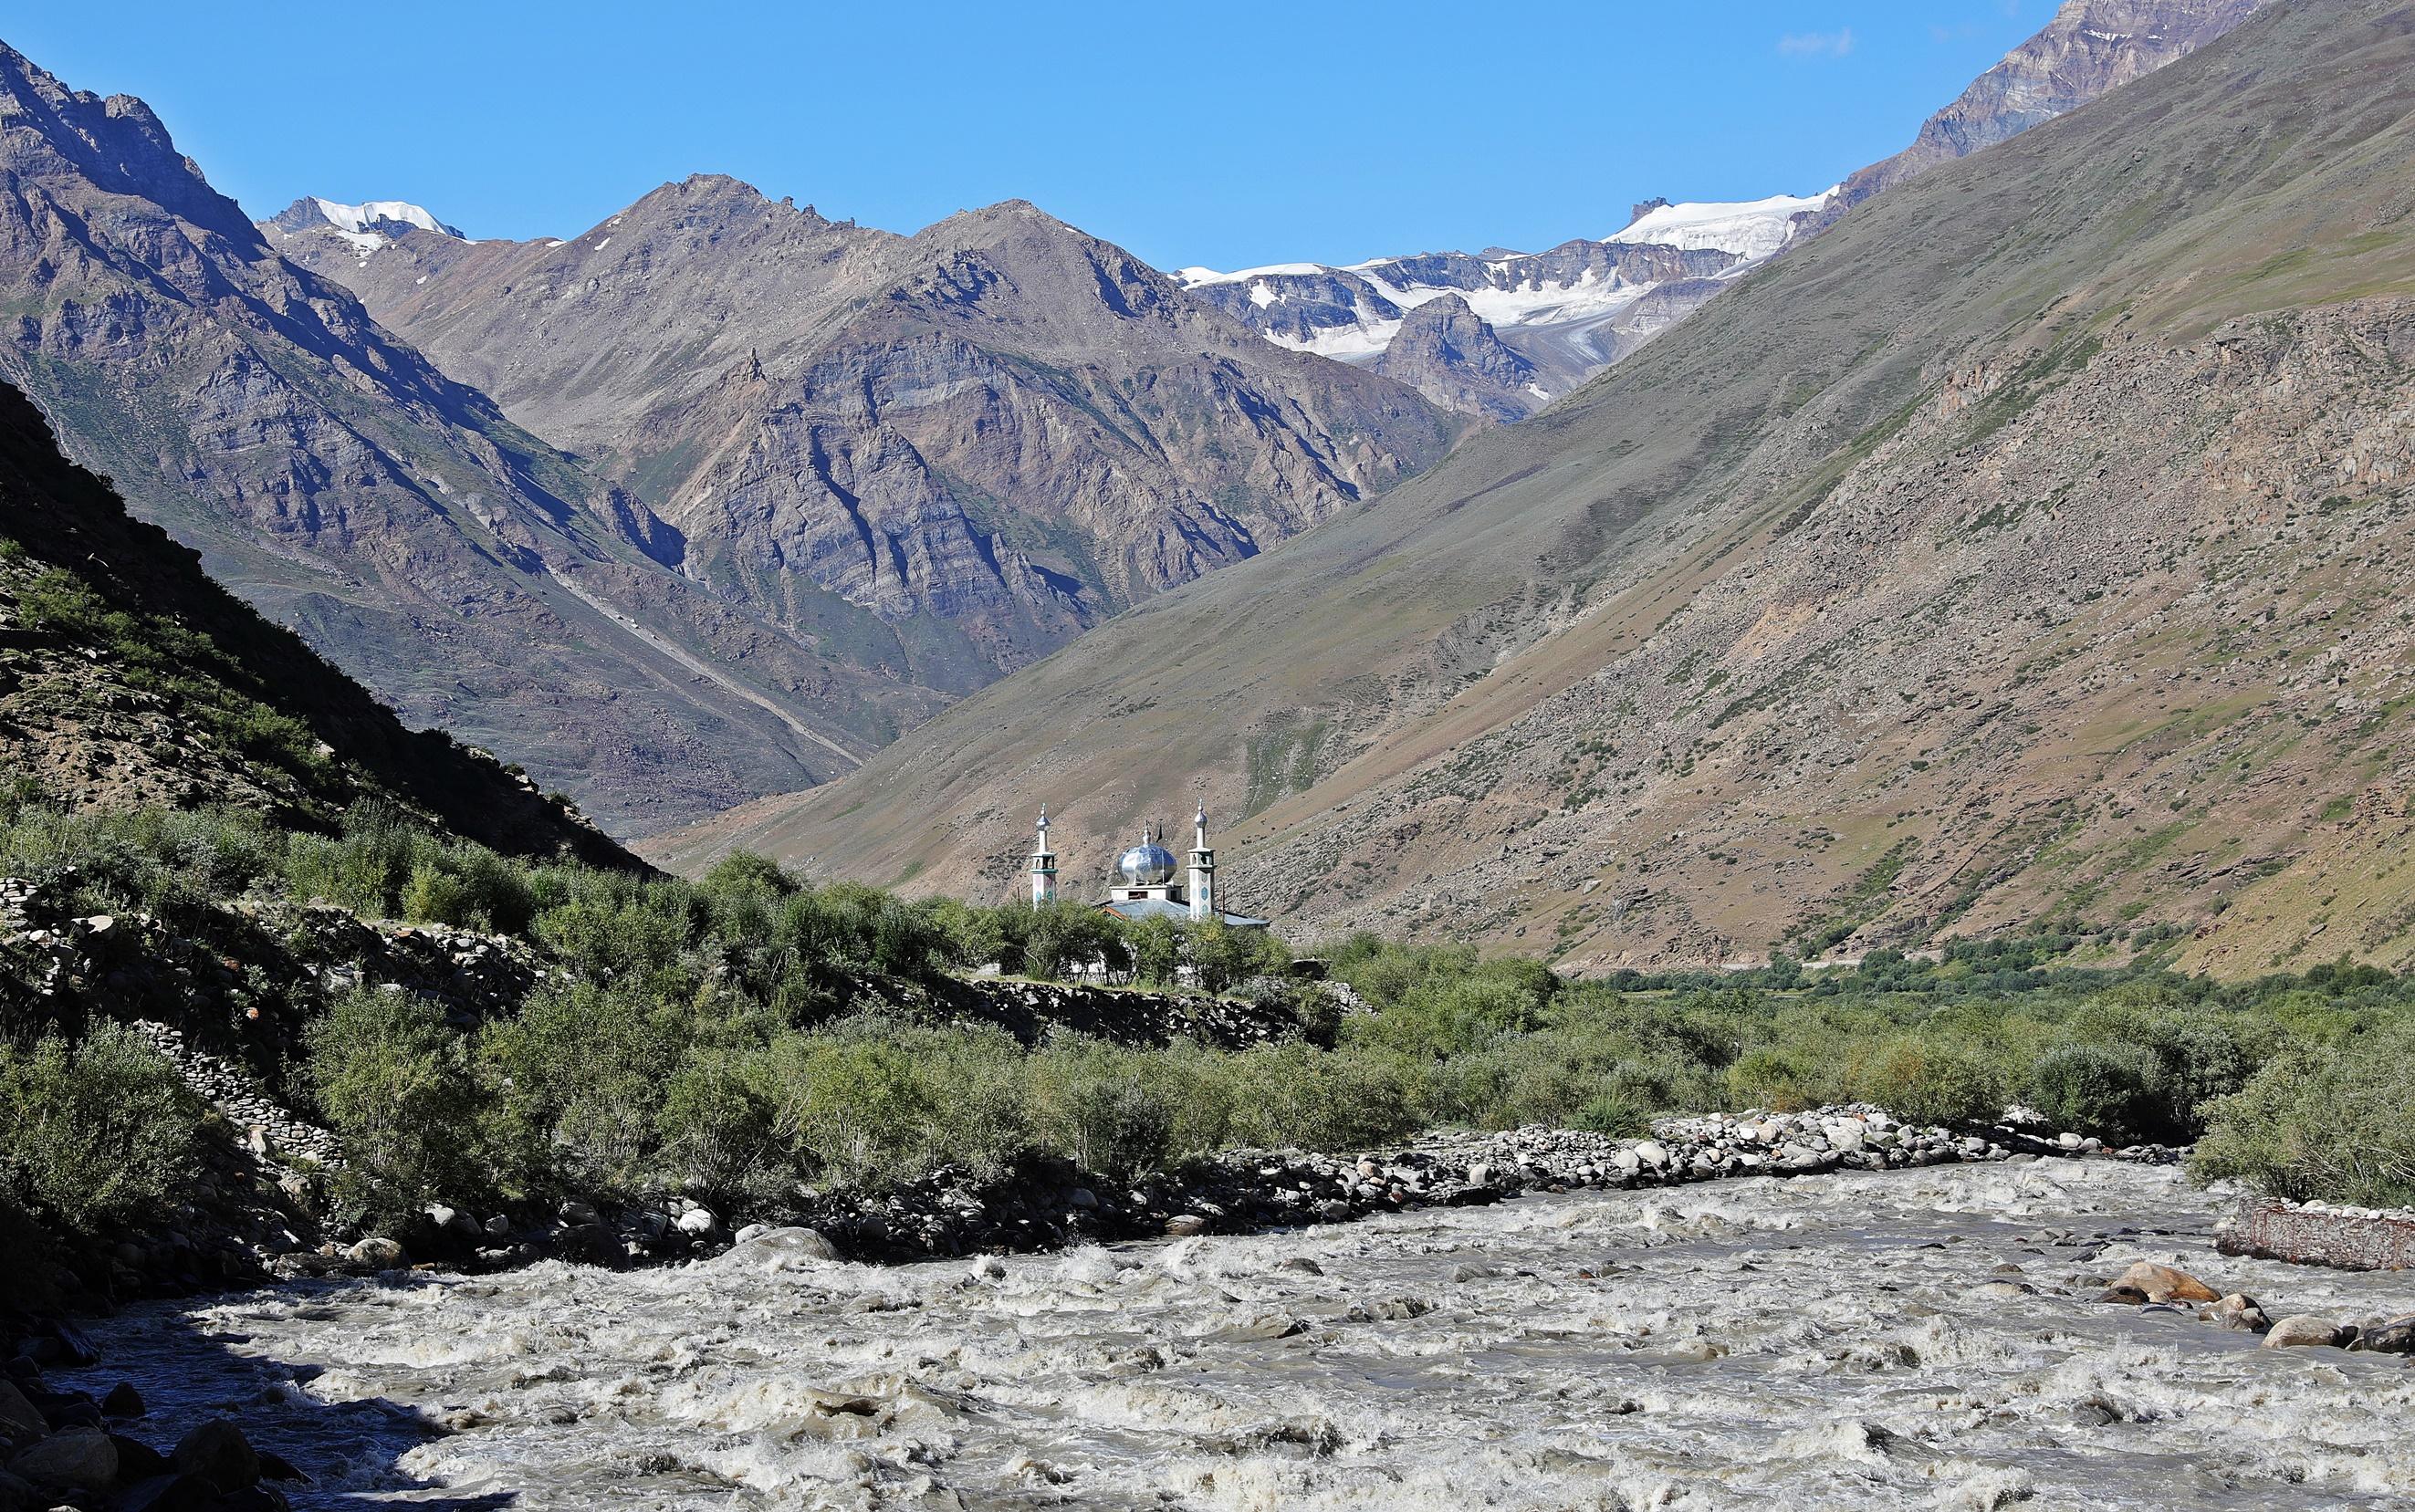 Mosque in the Zanskar region